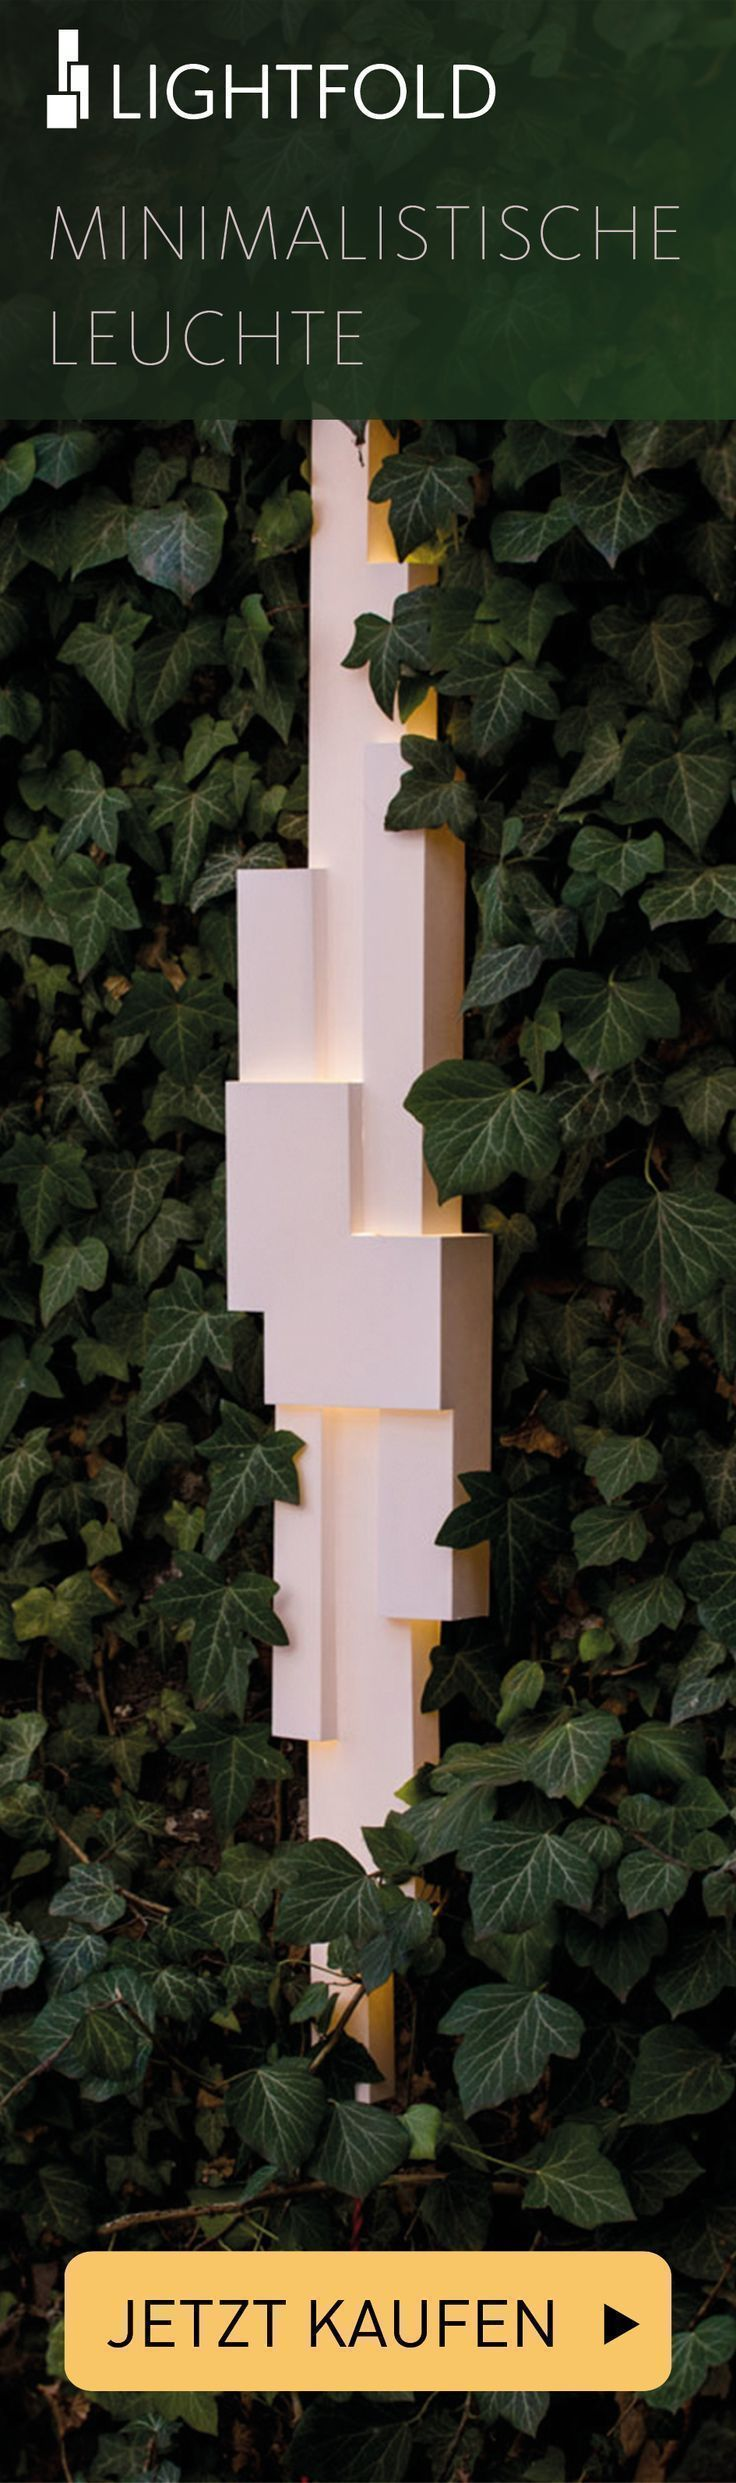 LightFold - Minimalistisches Licht - # - Art Style 2019!, #Art #Licht #LightFold #Minimalistisches #Style